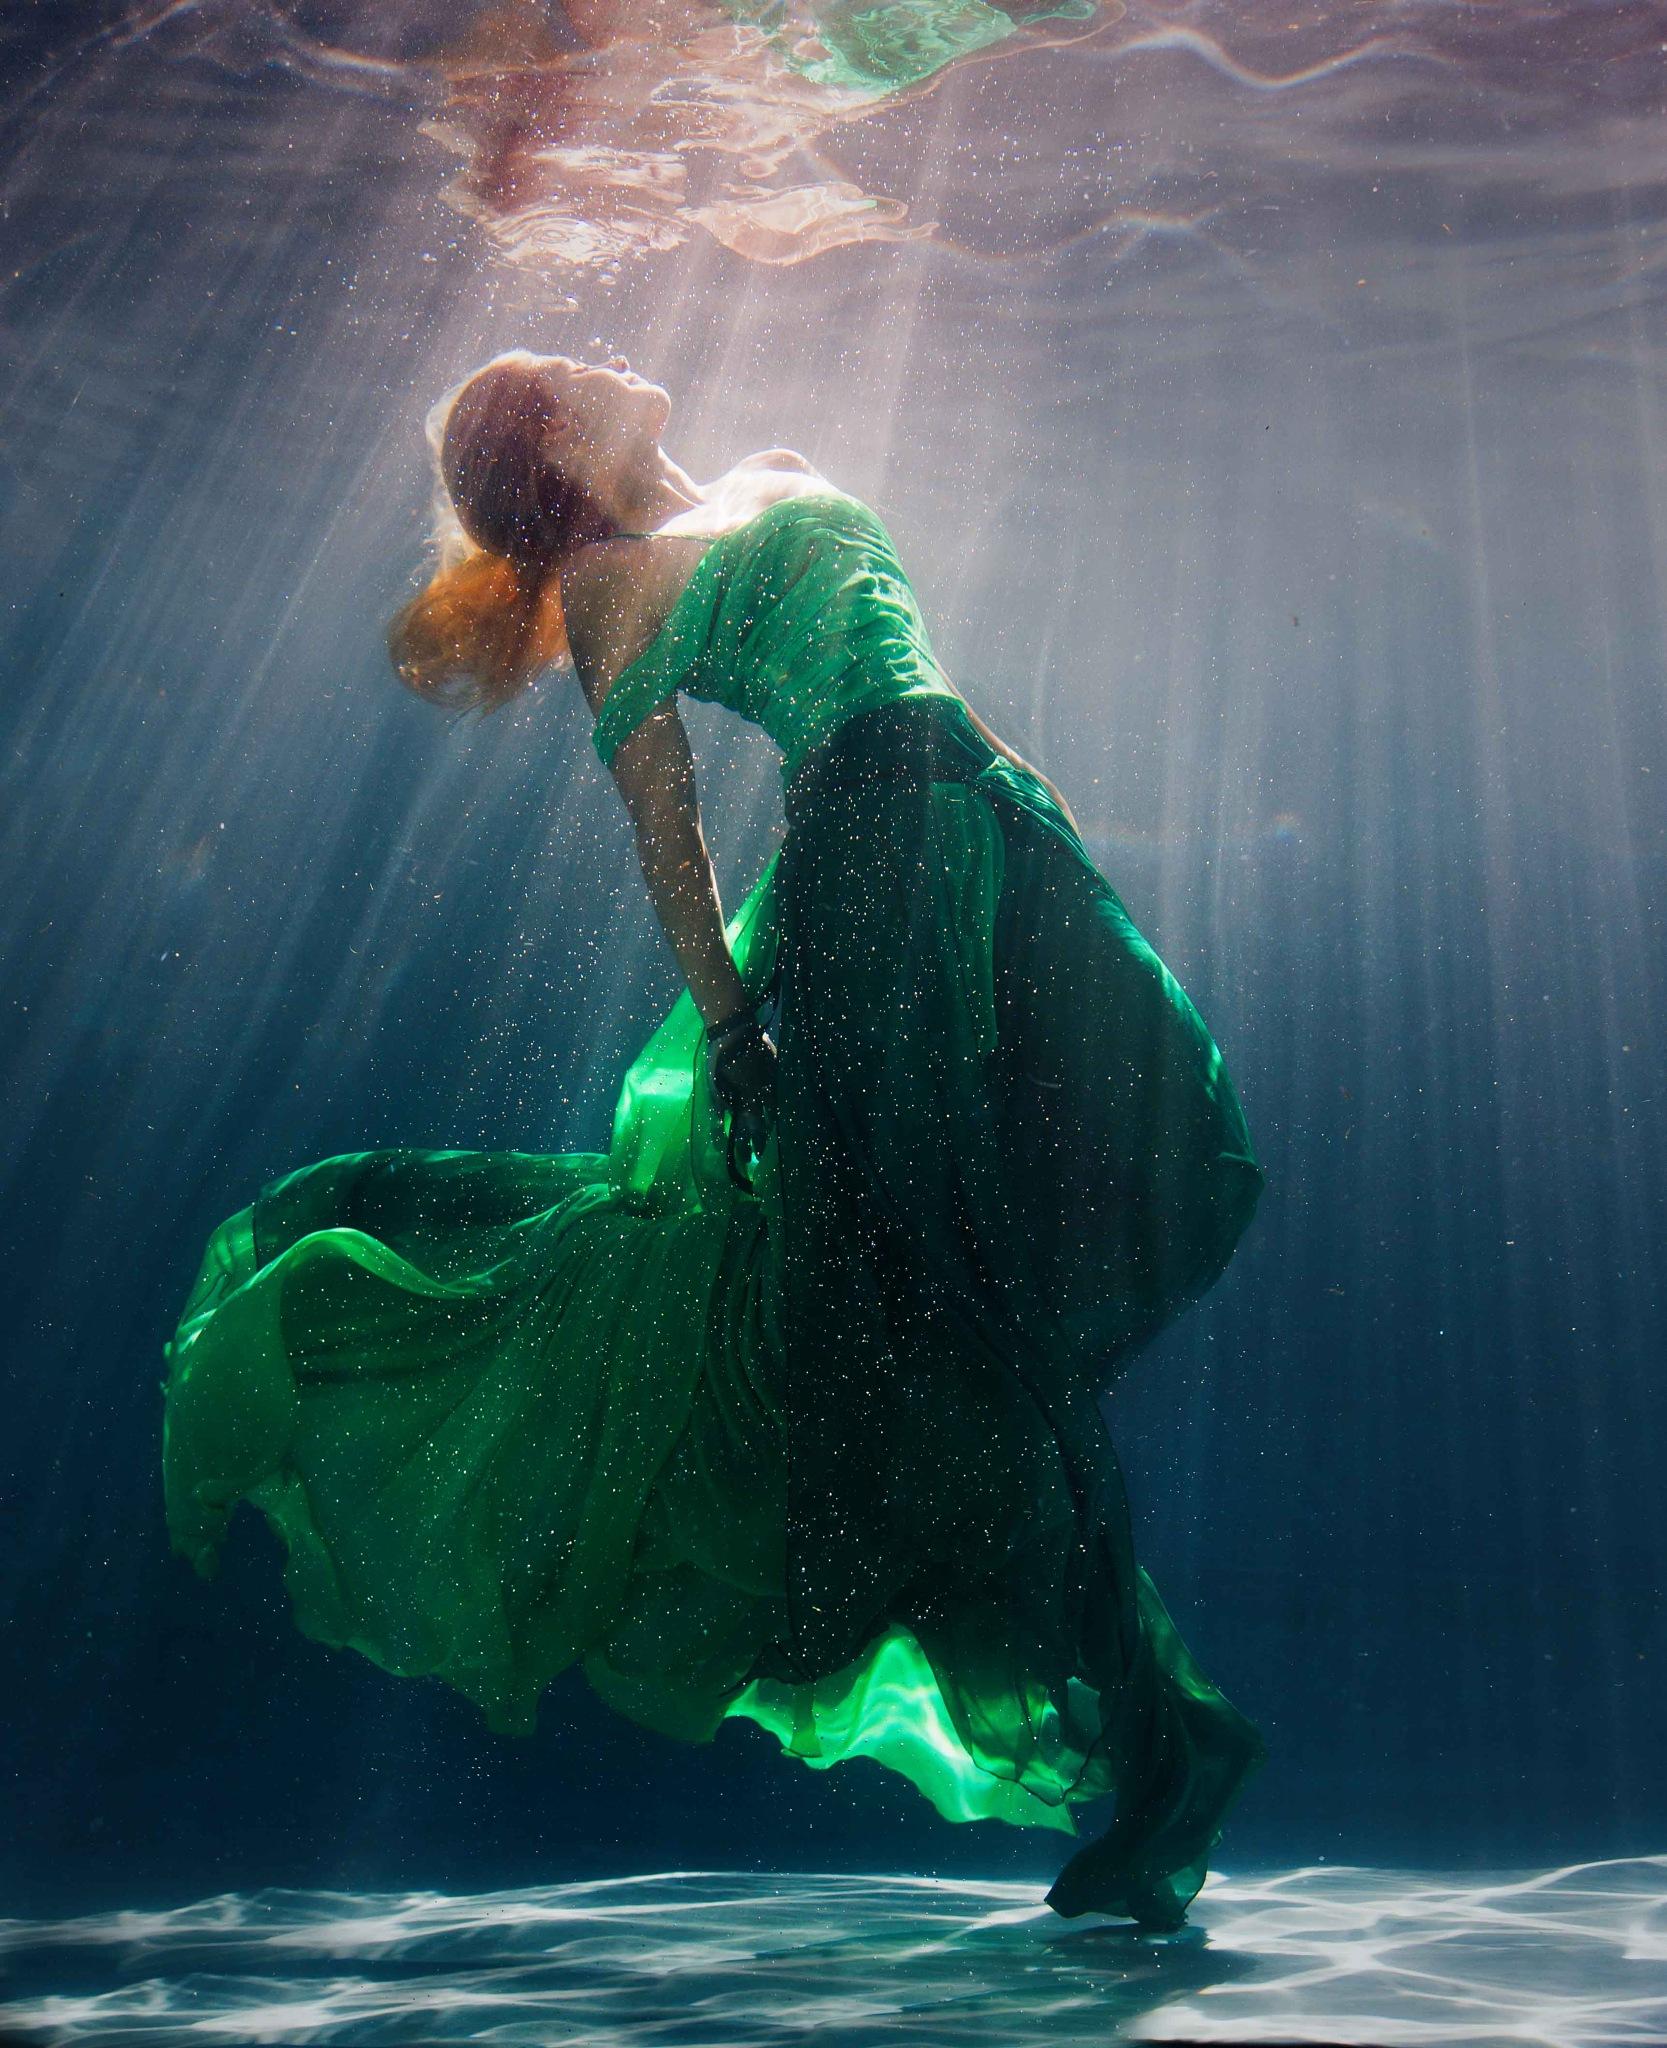 Sirena by Gabriela Slegrova Solms